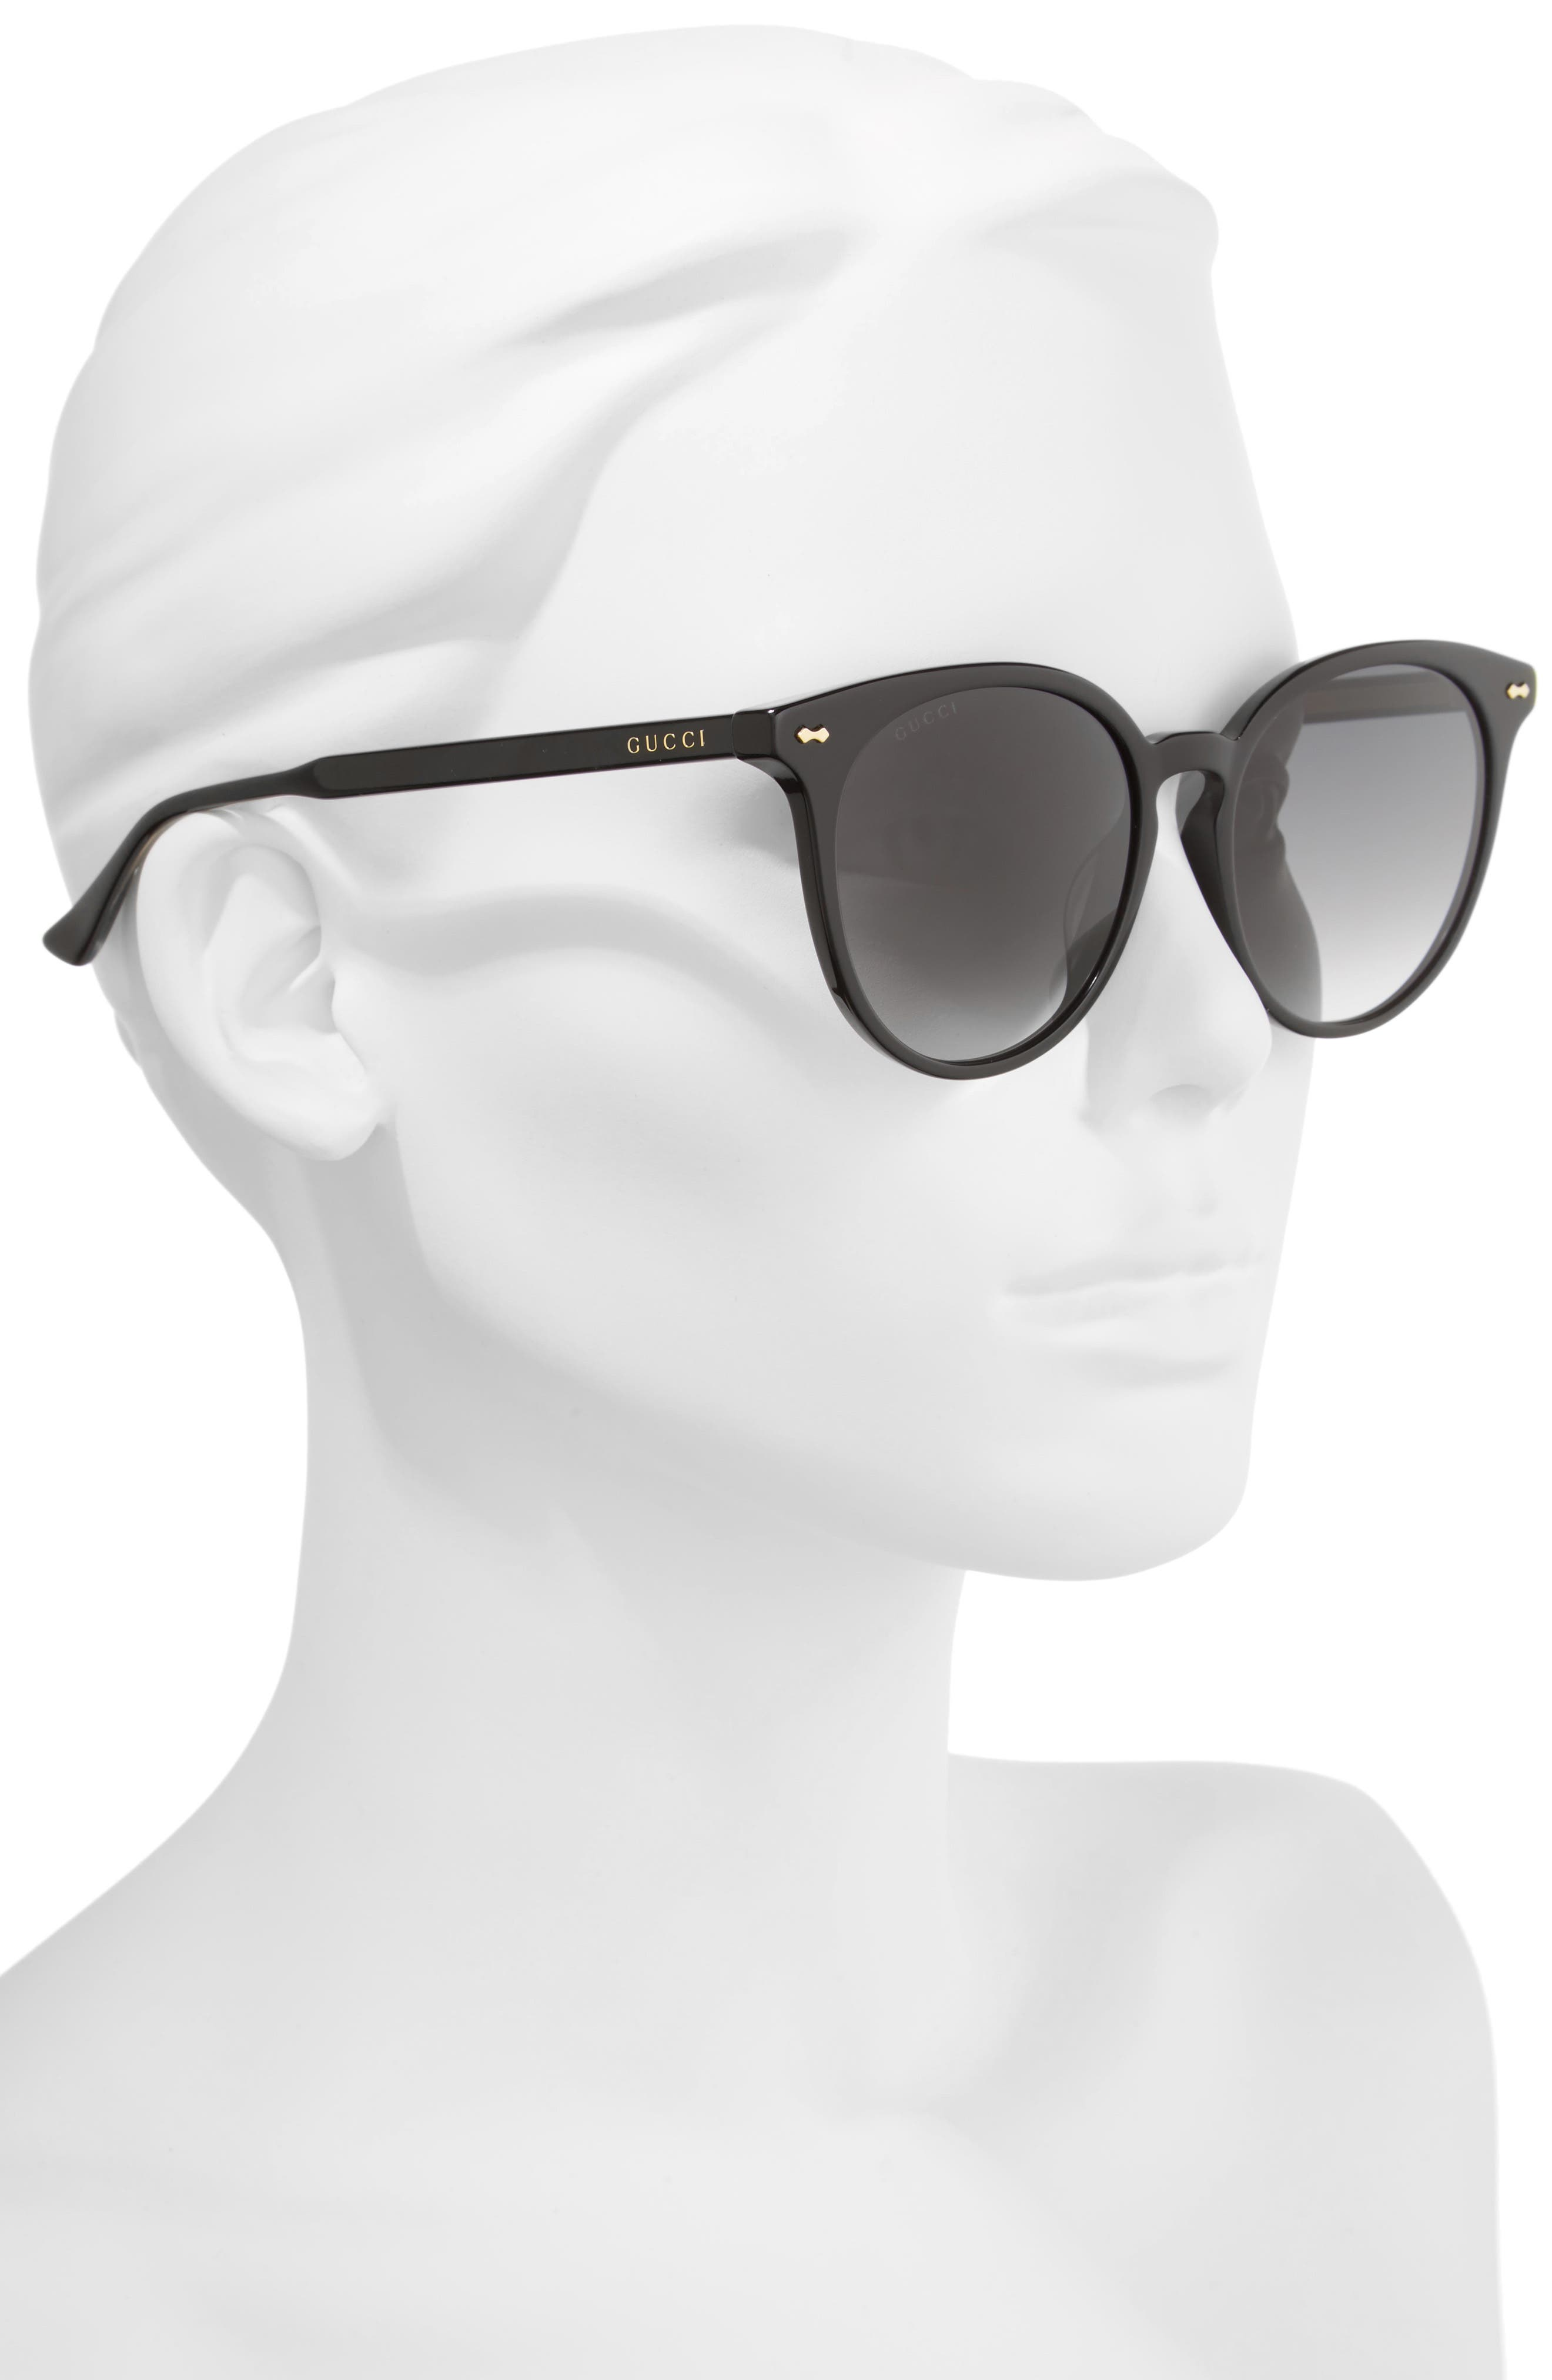 55mm Round Cat Eye Sunglasses,                             Alternate thumbnail 2, color,                             Black